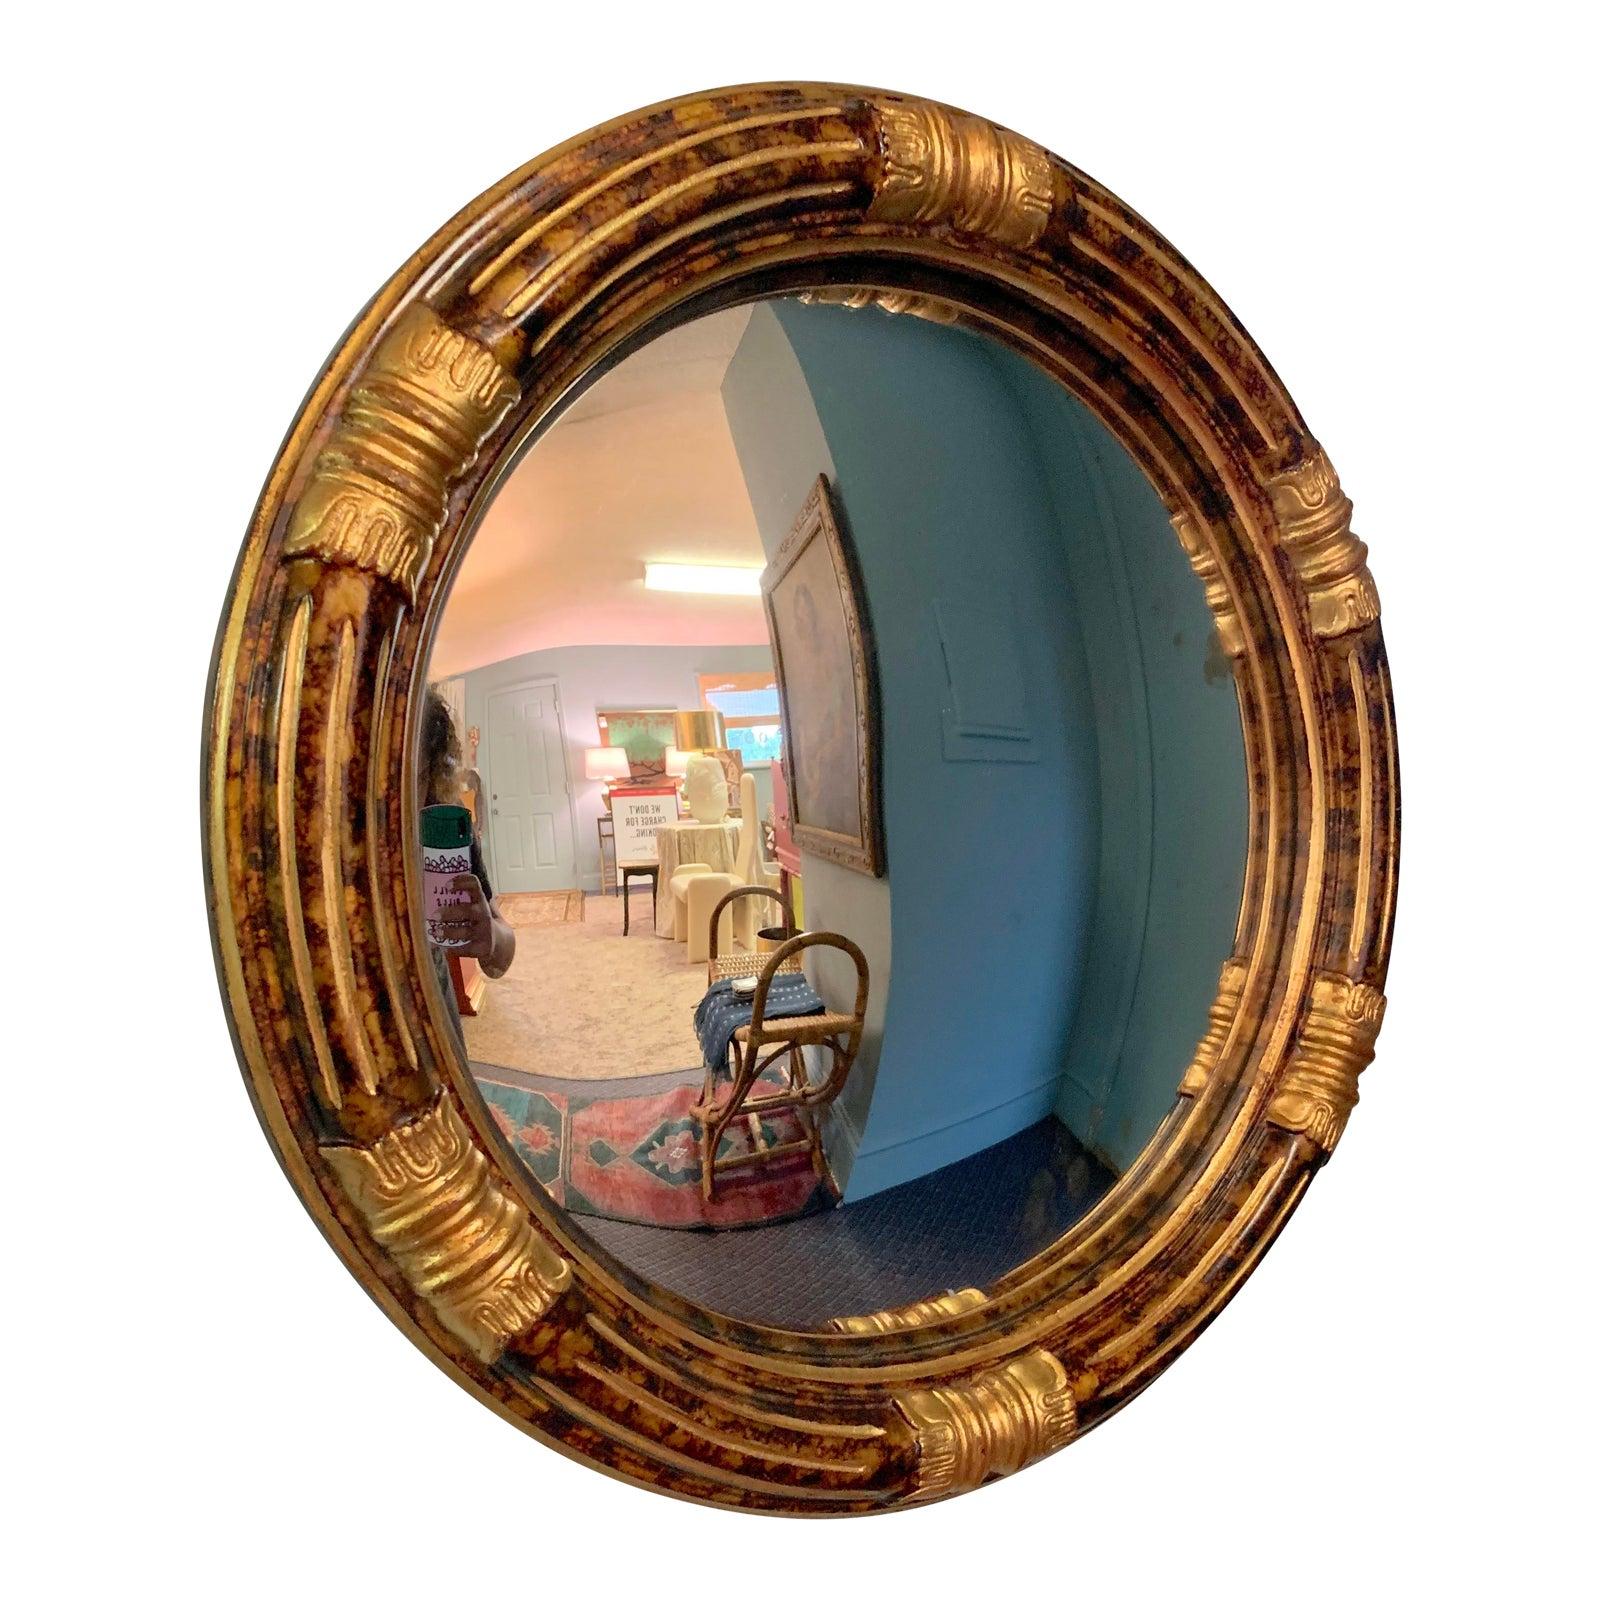 maitland-smith-convex-mirror-3439.jpeg